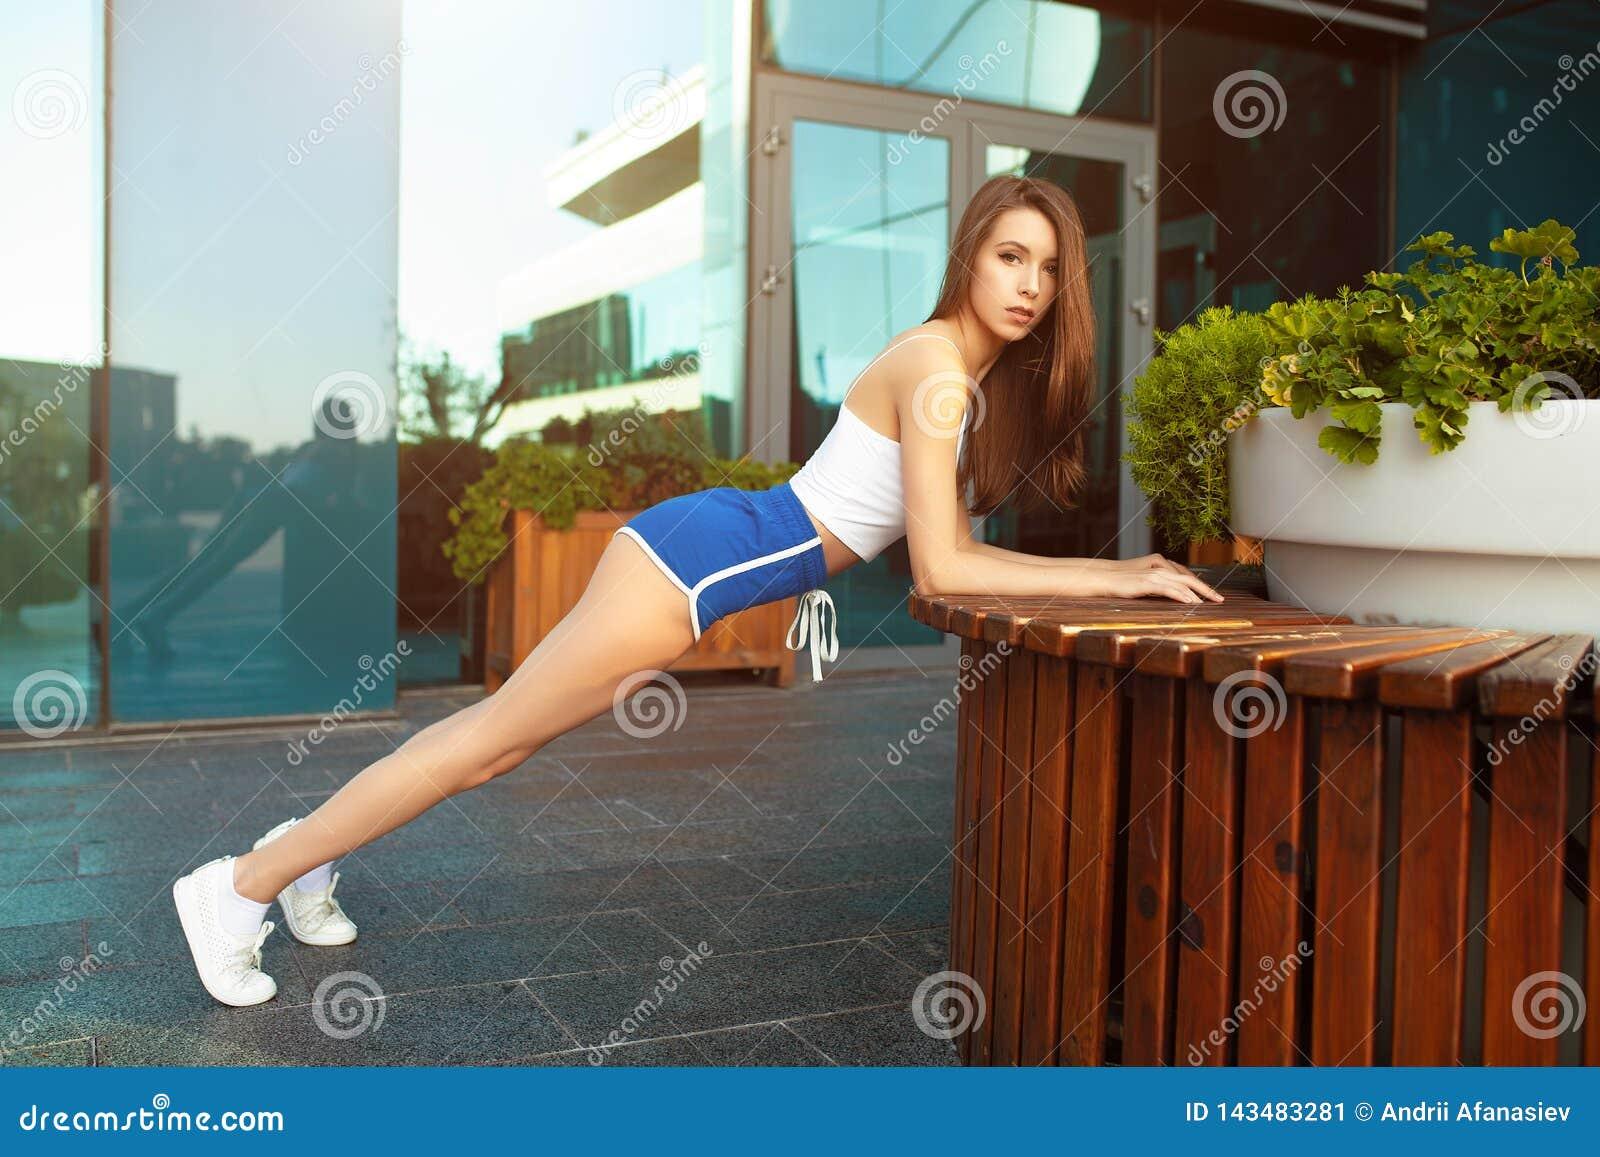 Slank flicka f?r idrottsman nen f?r ung kvinna f?r kondition som utanf?r g?r planka?vning Passform f?r kors f?r gymnastik f?r cro